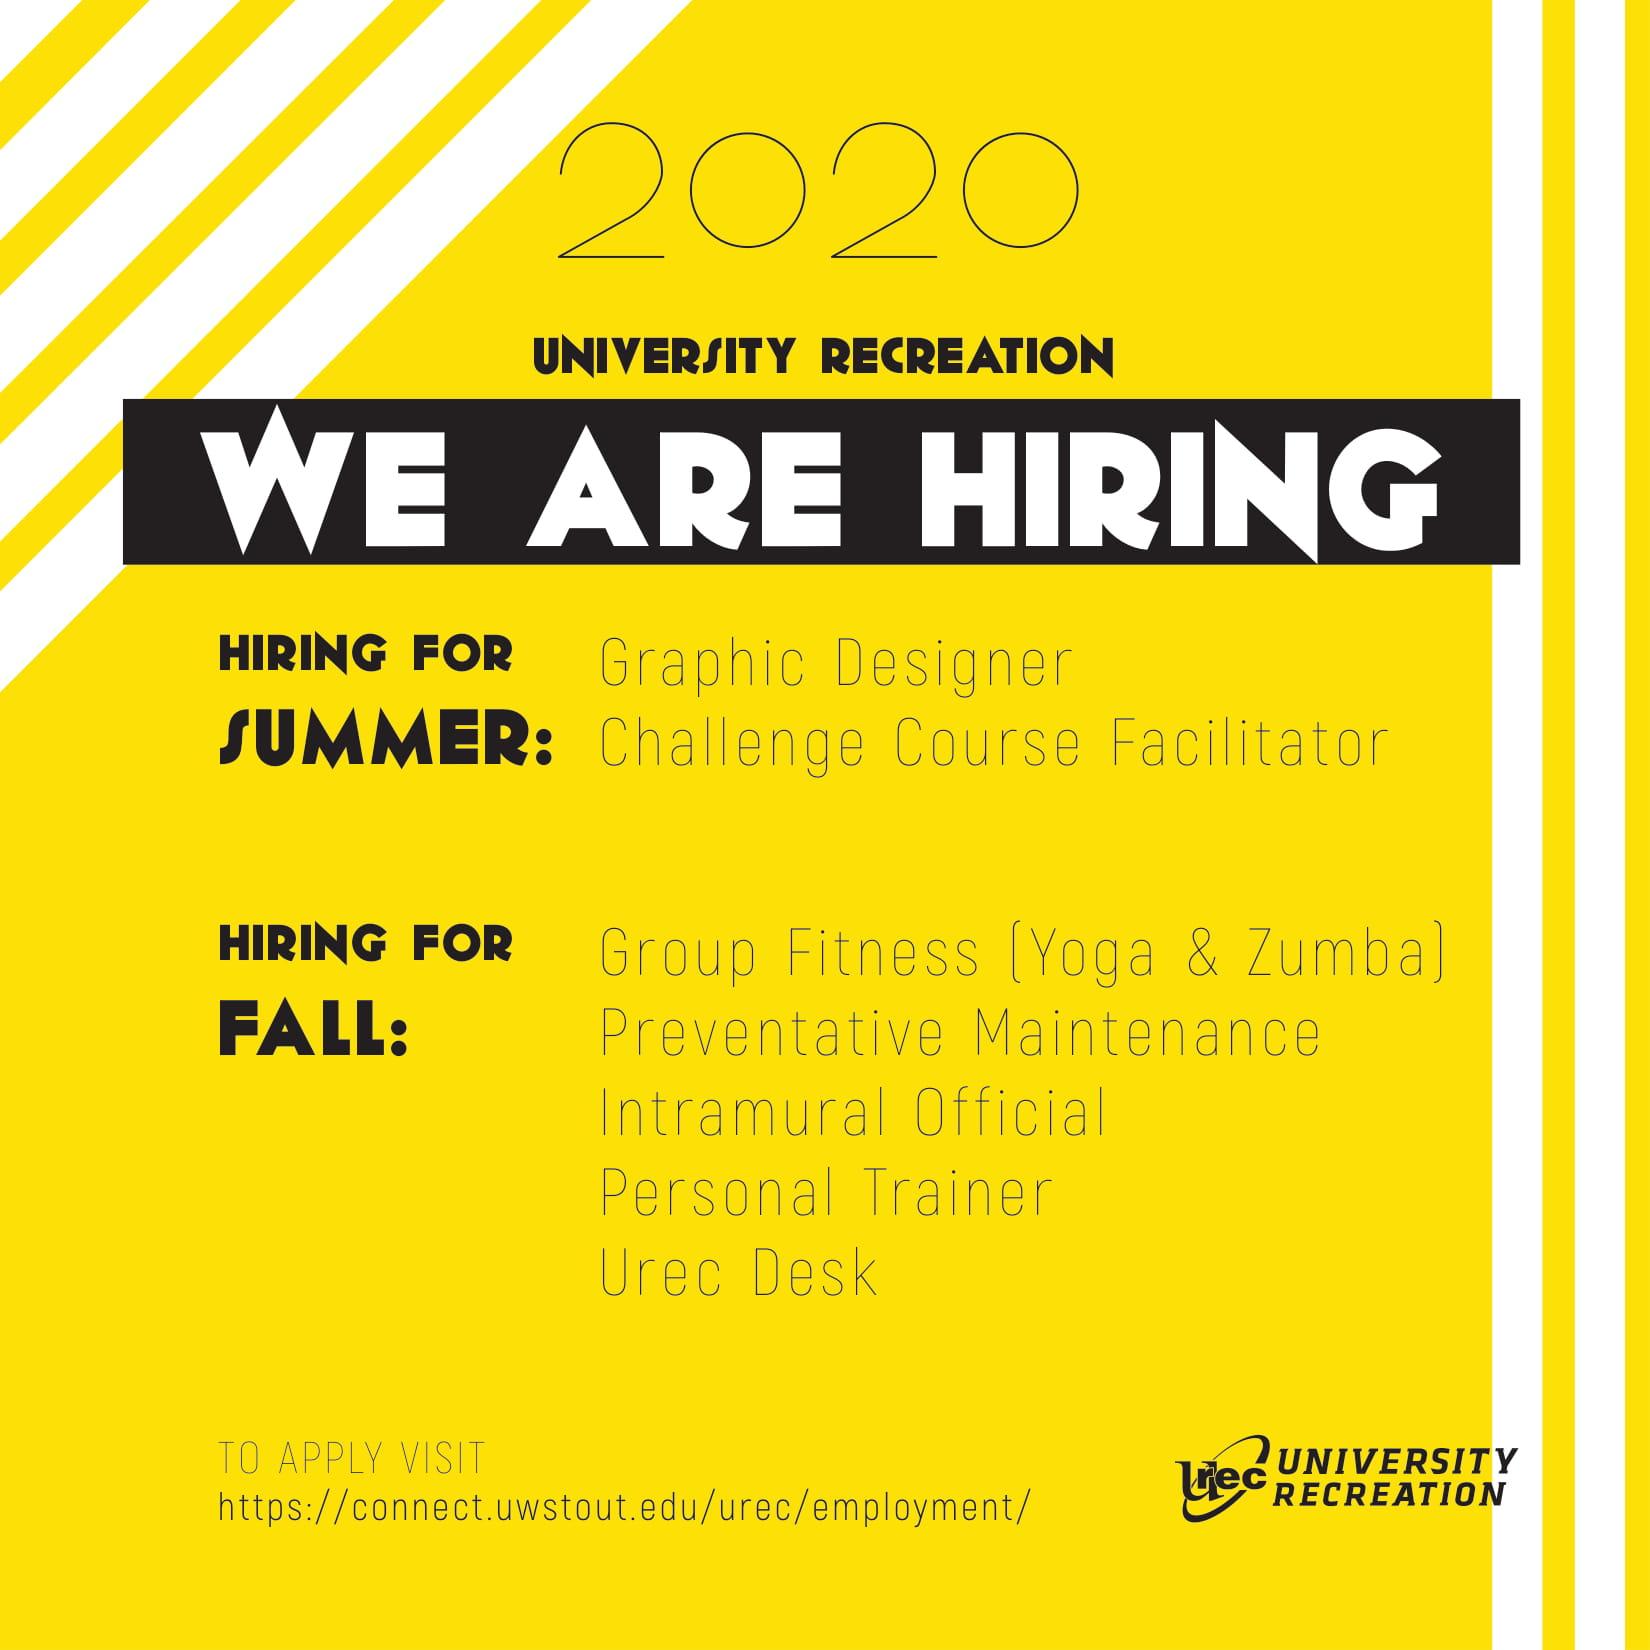 University Recreation Hiring